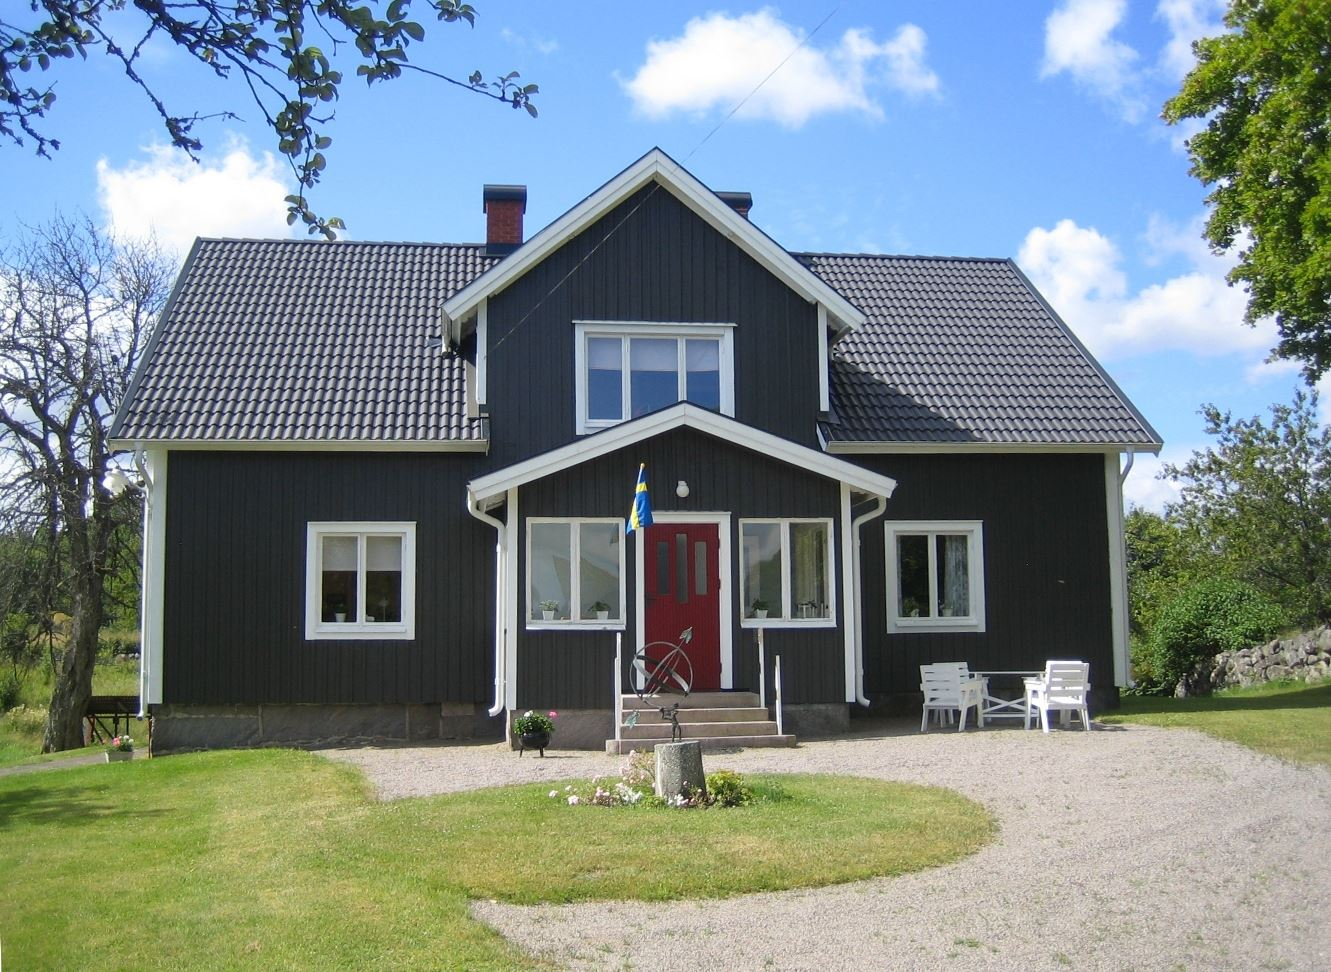 GS64008 Olofshylte, Lönashult